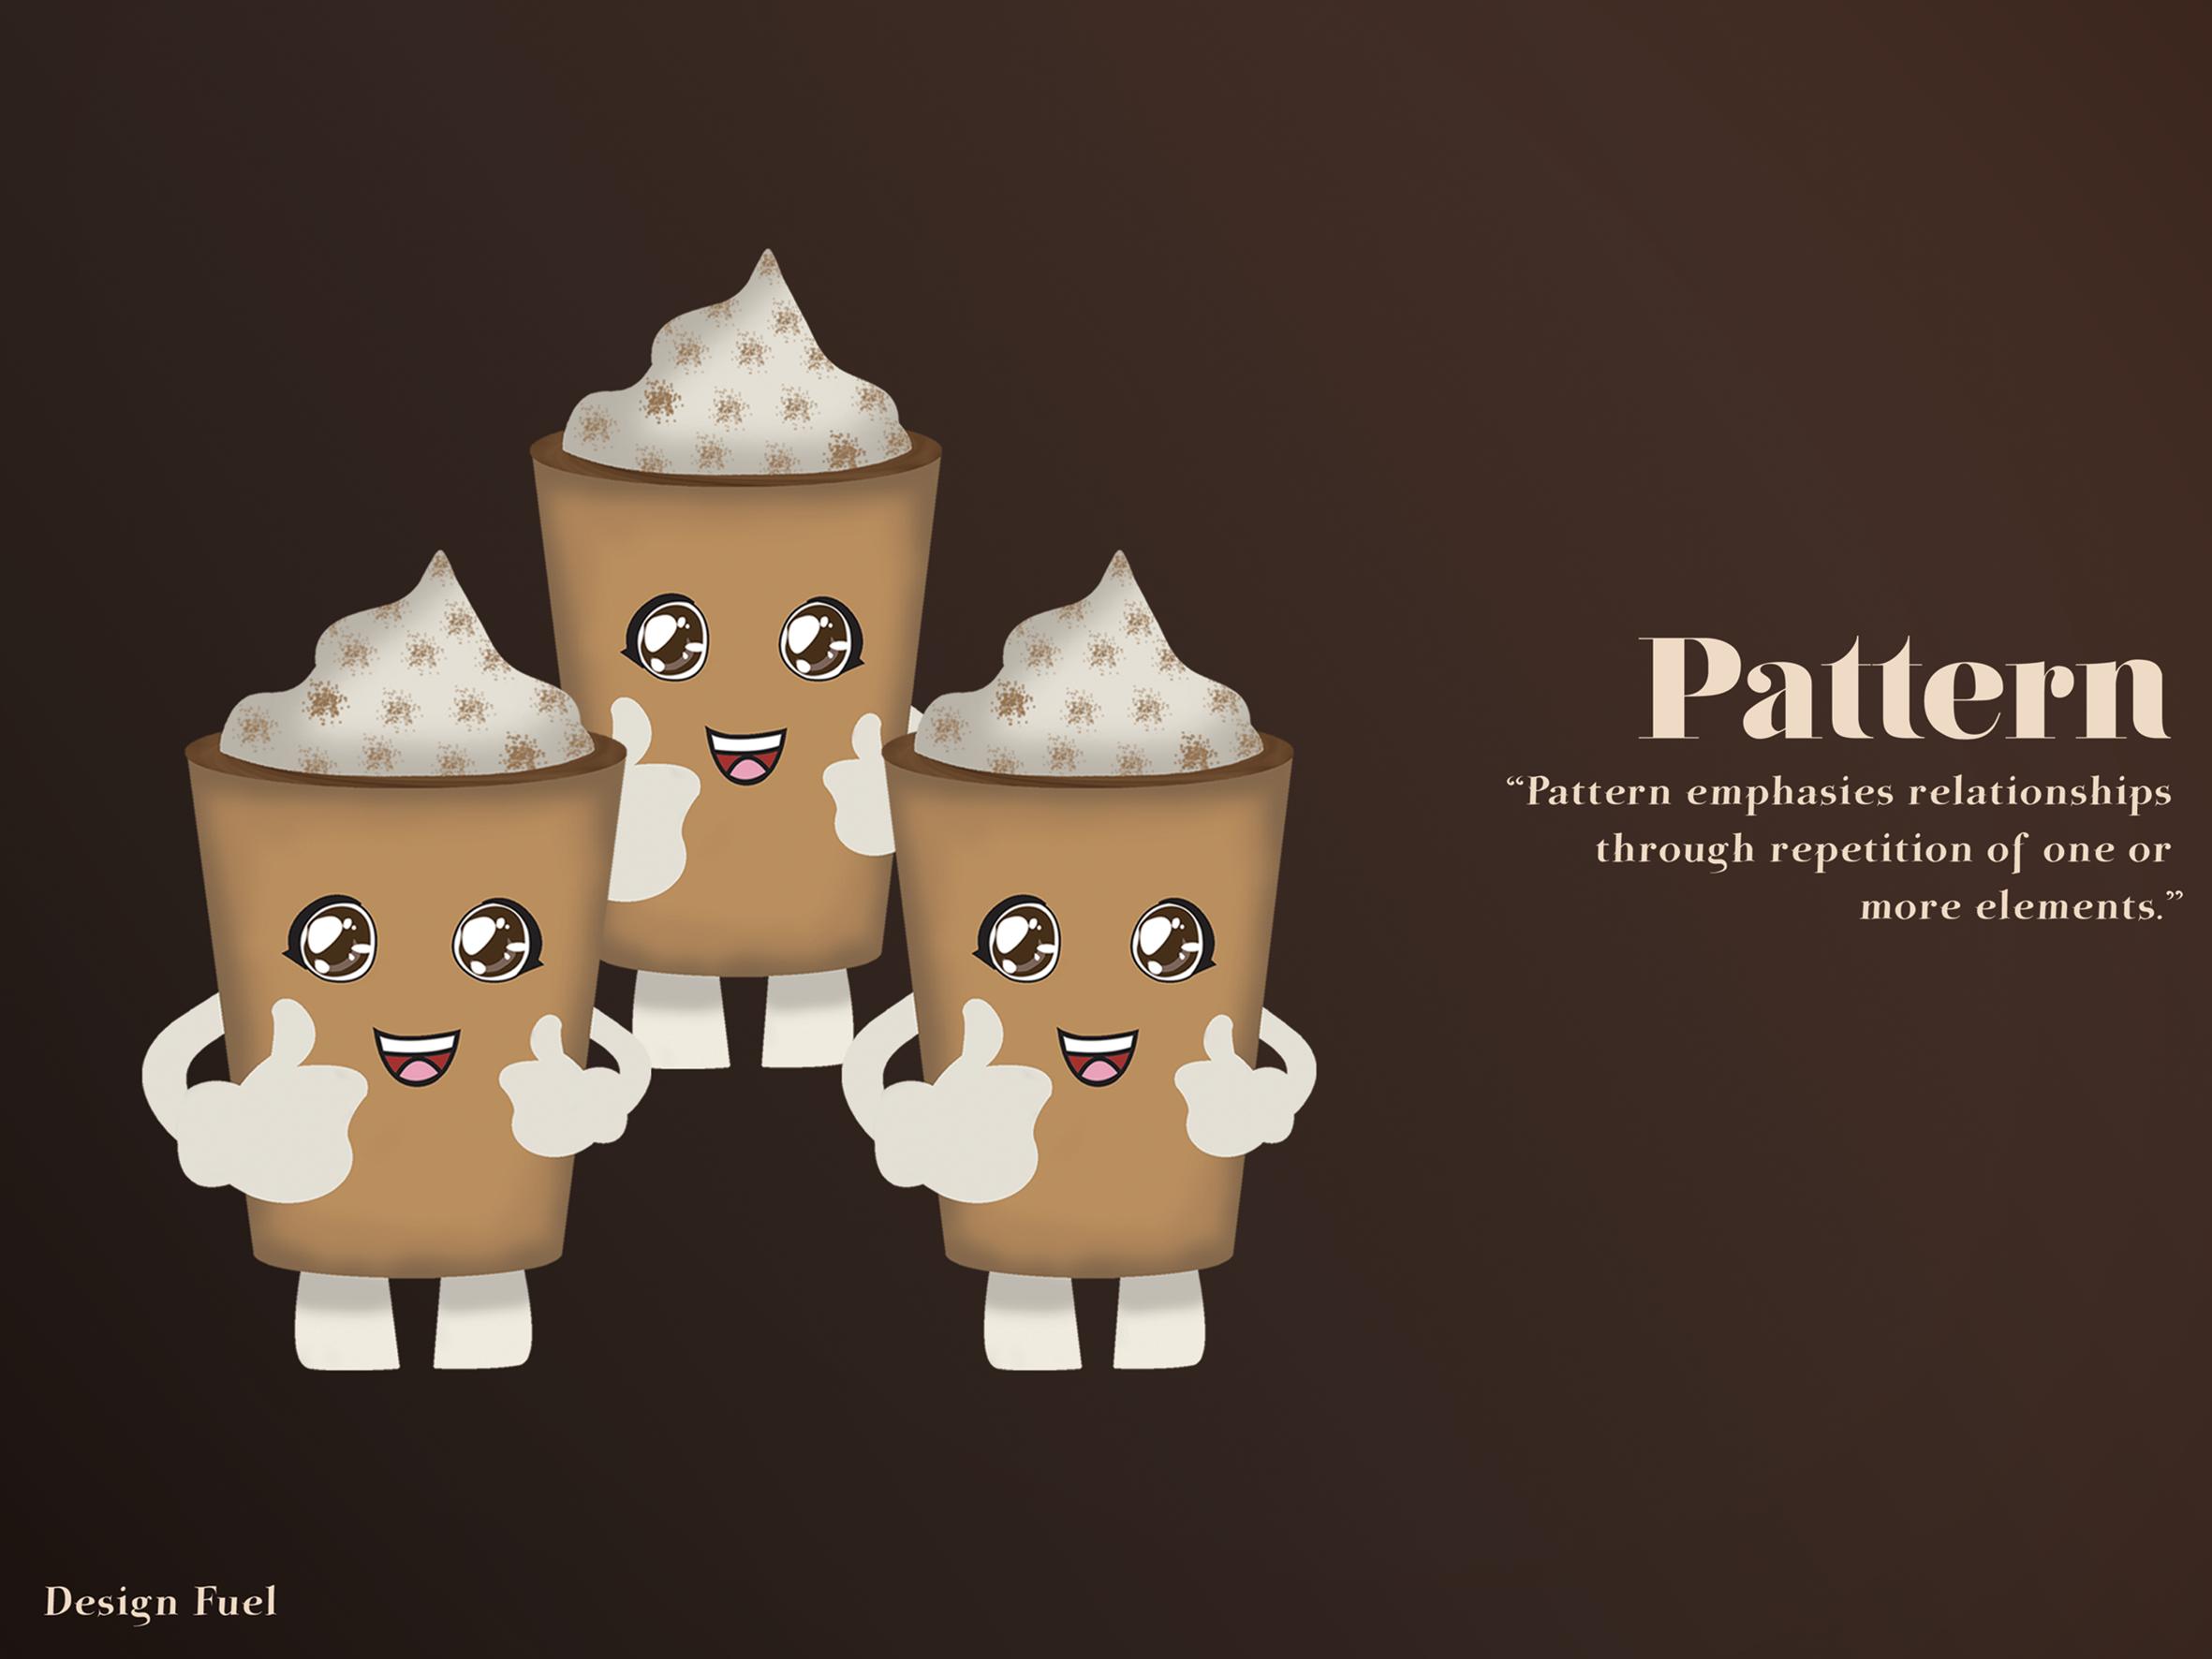 DesignFuel_Pattern.png